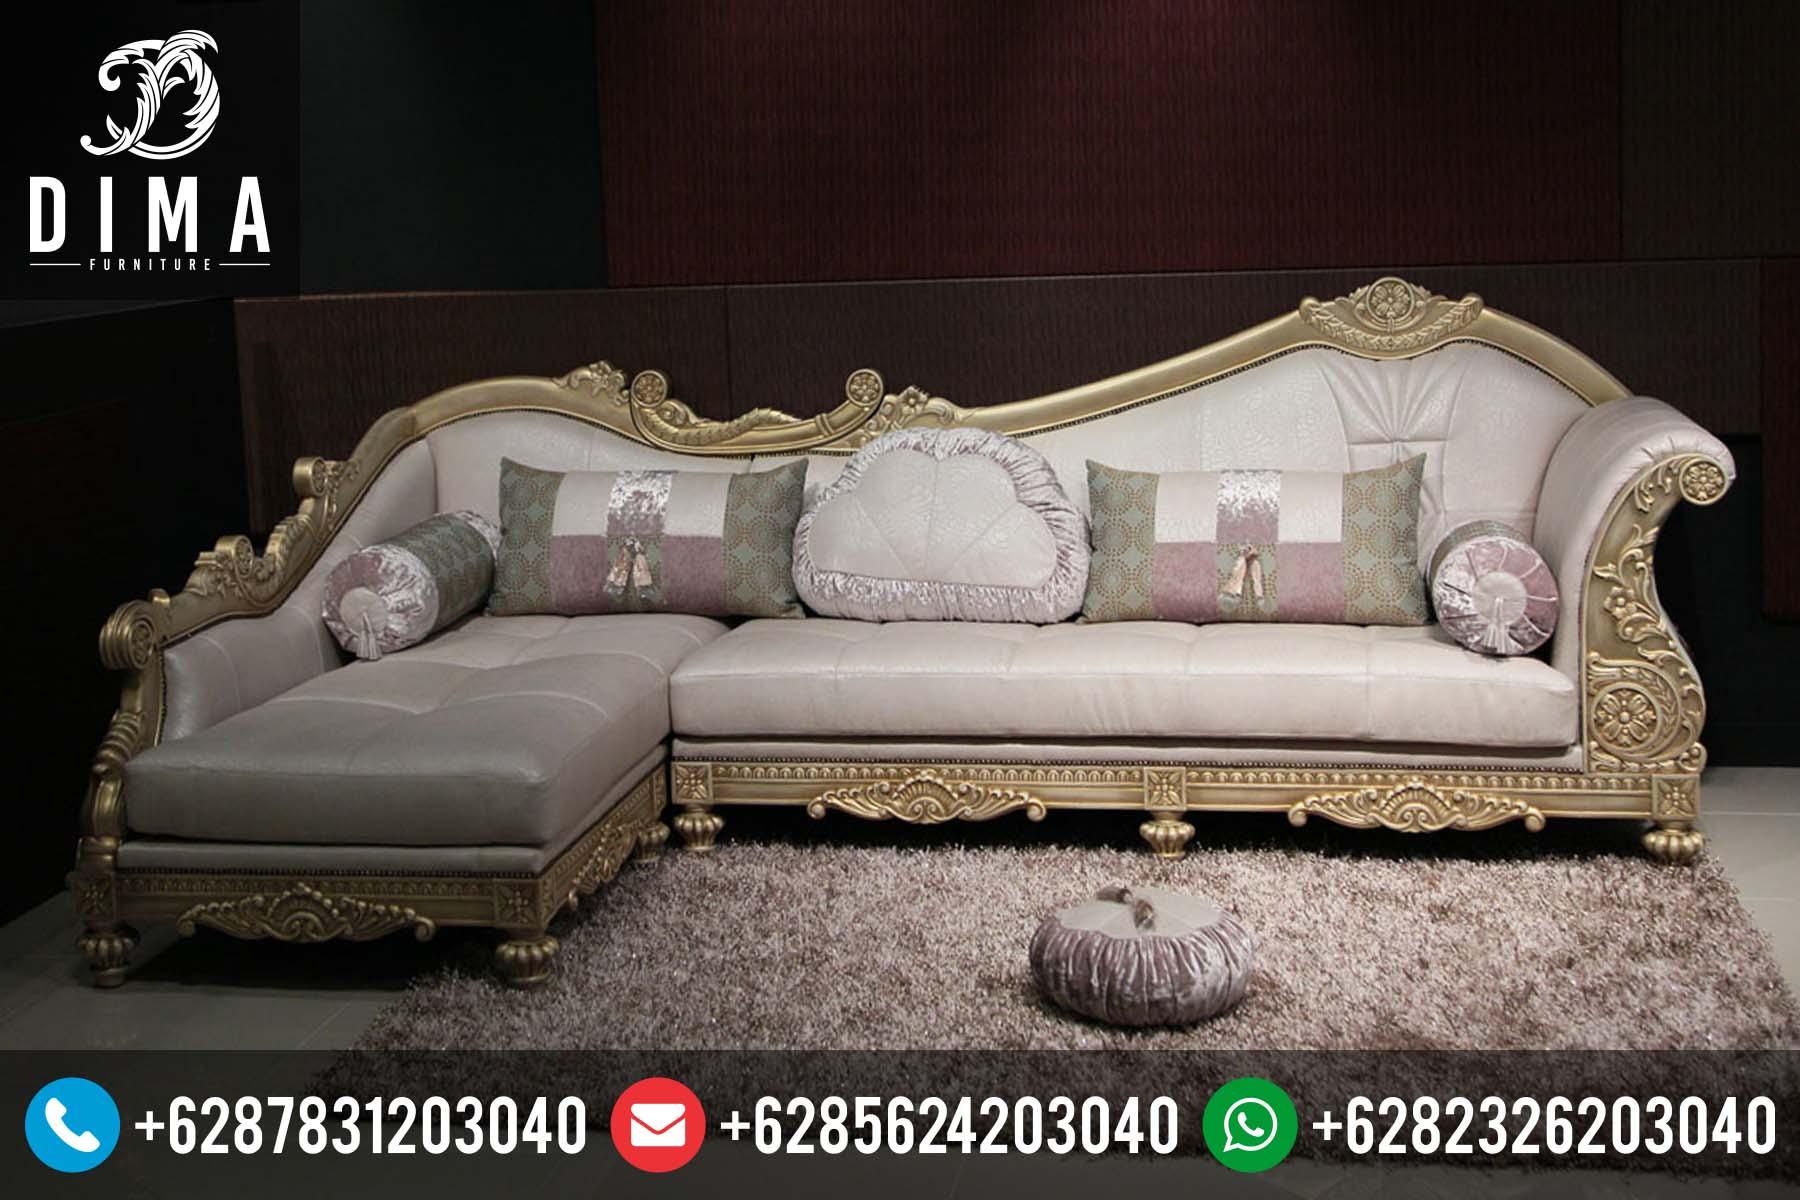 Kursi Sofa Sudut L Klasik Minimalis Mewah Terbaru Harga